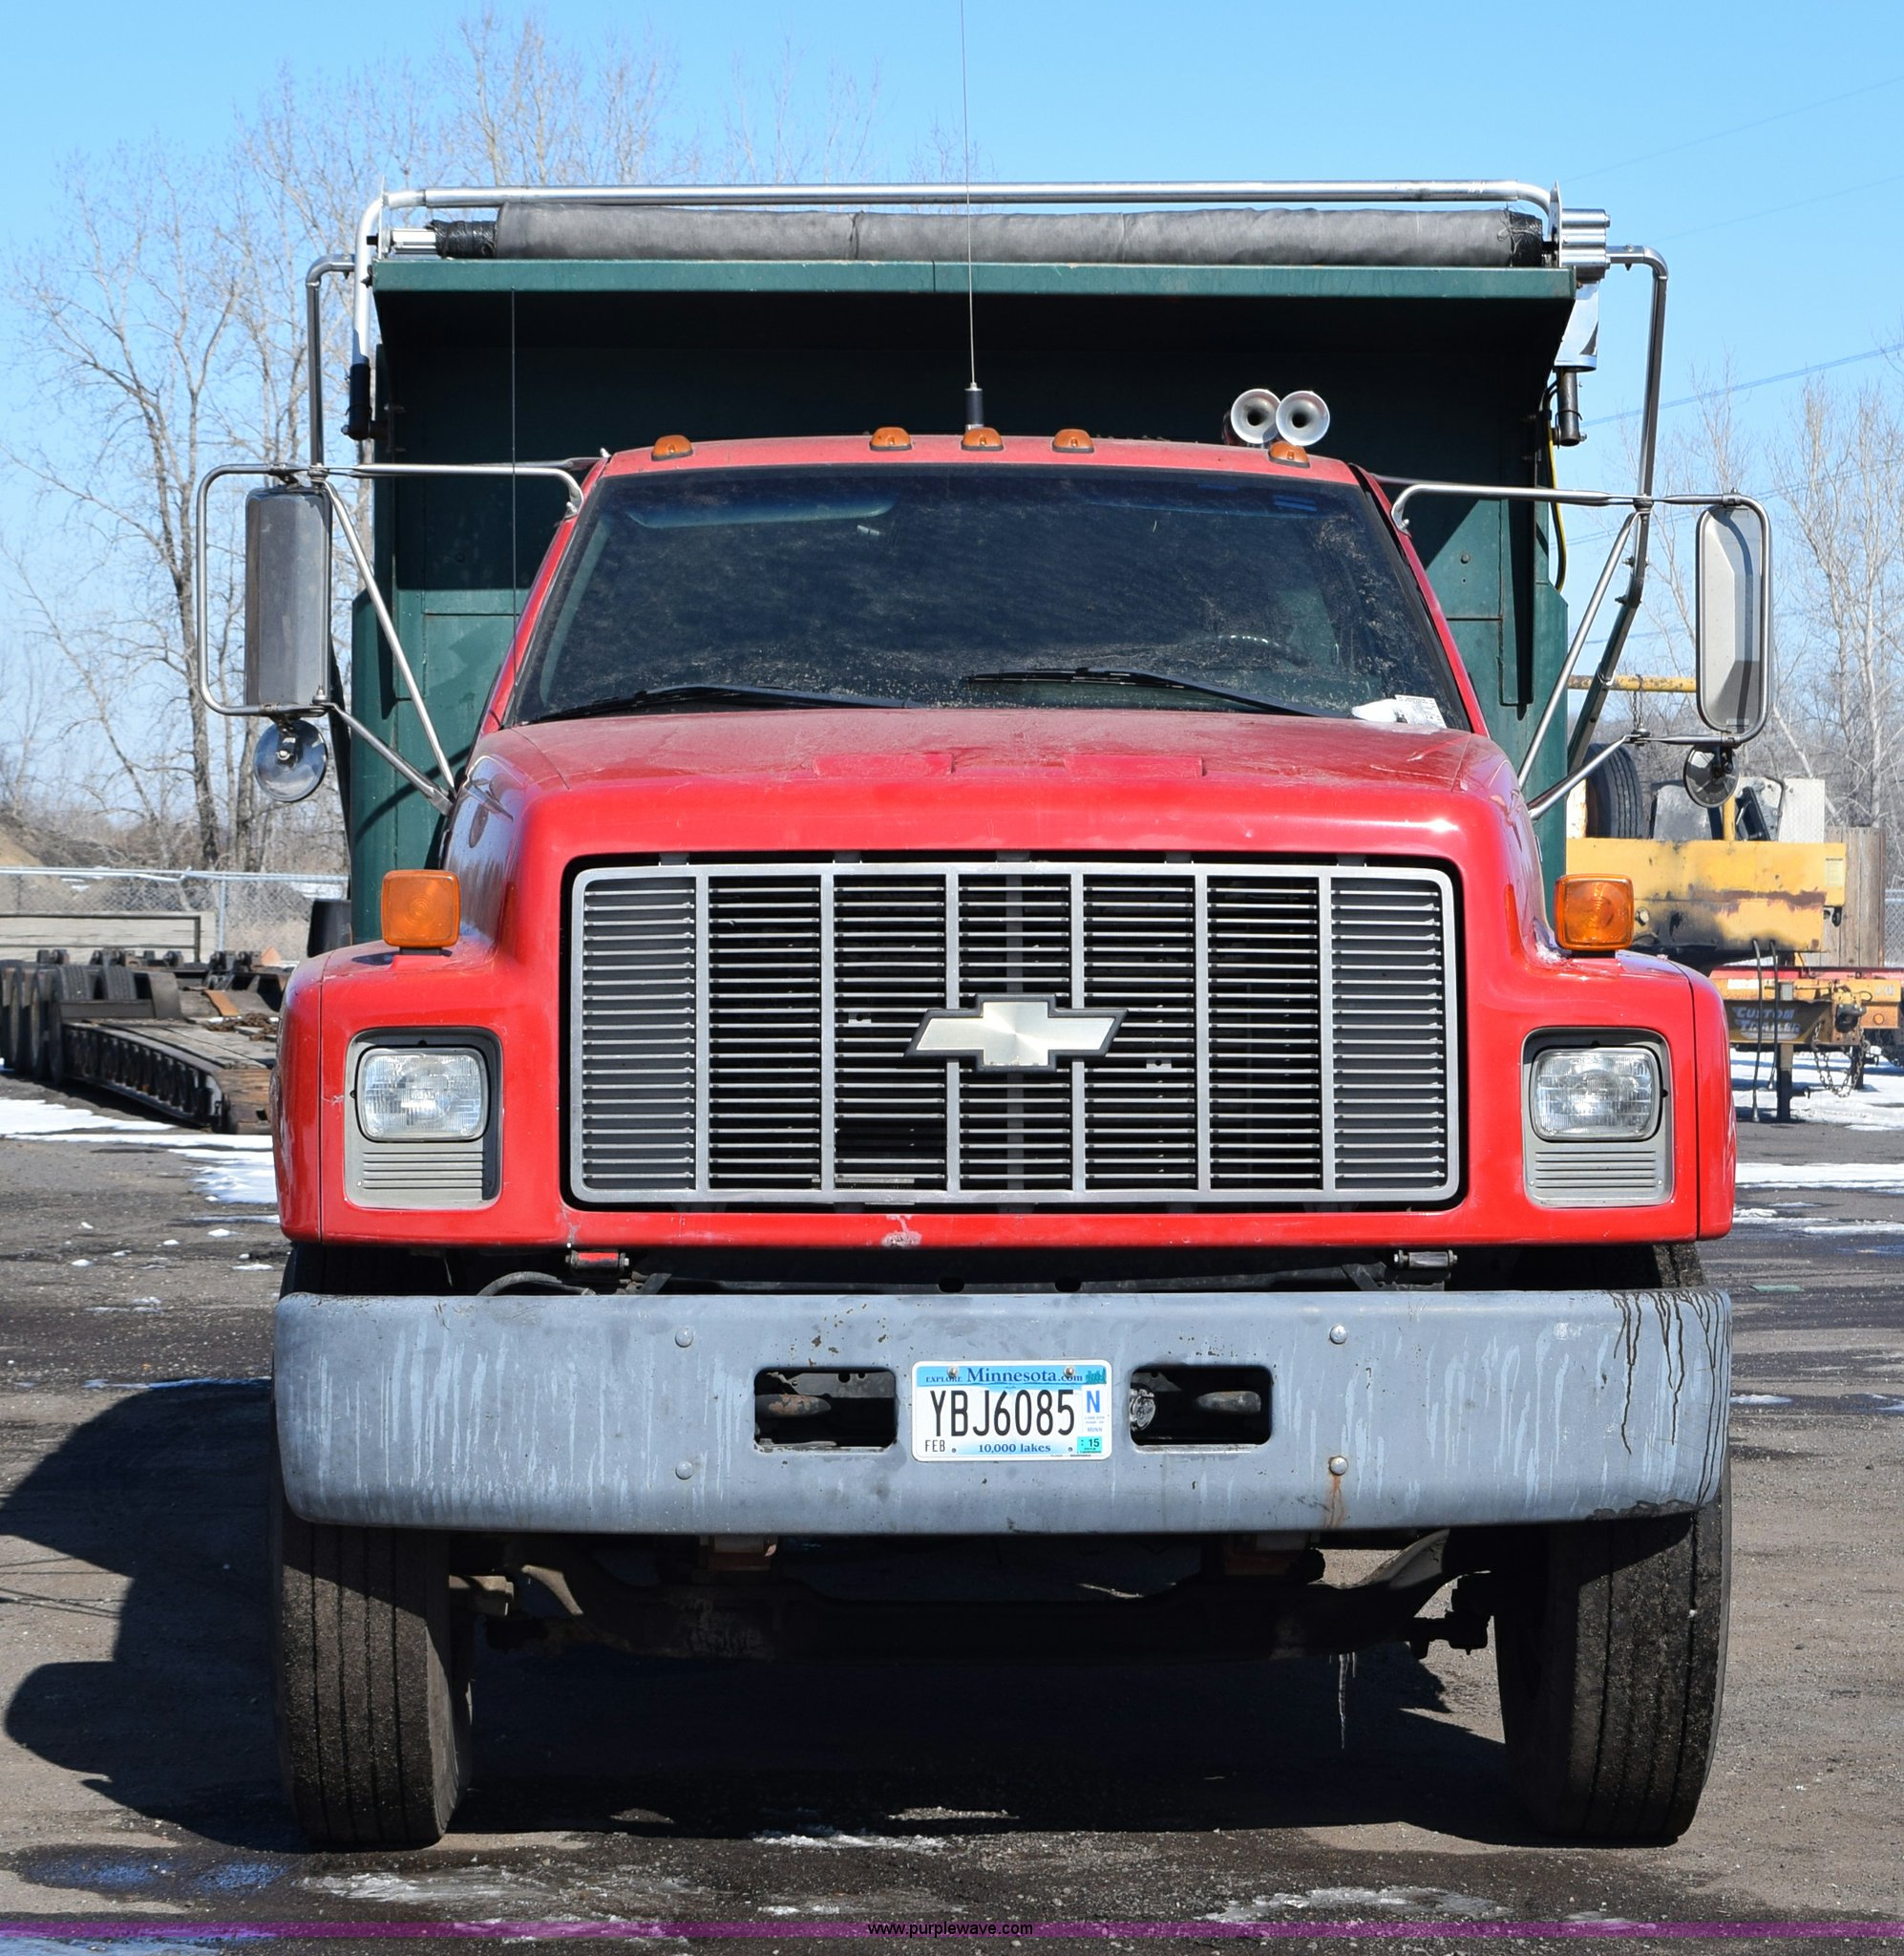 1995 Chevrolet Kodiak Dump Truck Item J1986 Sold April Chevy Full Size In New Window